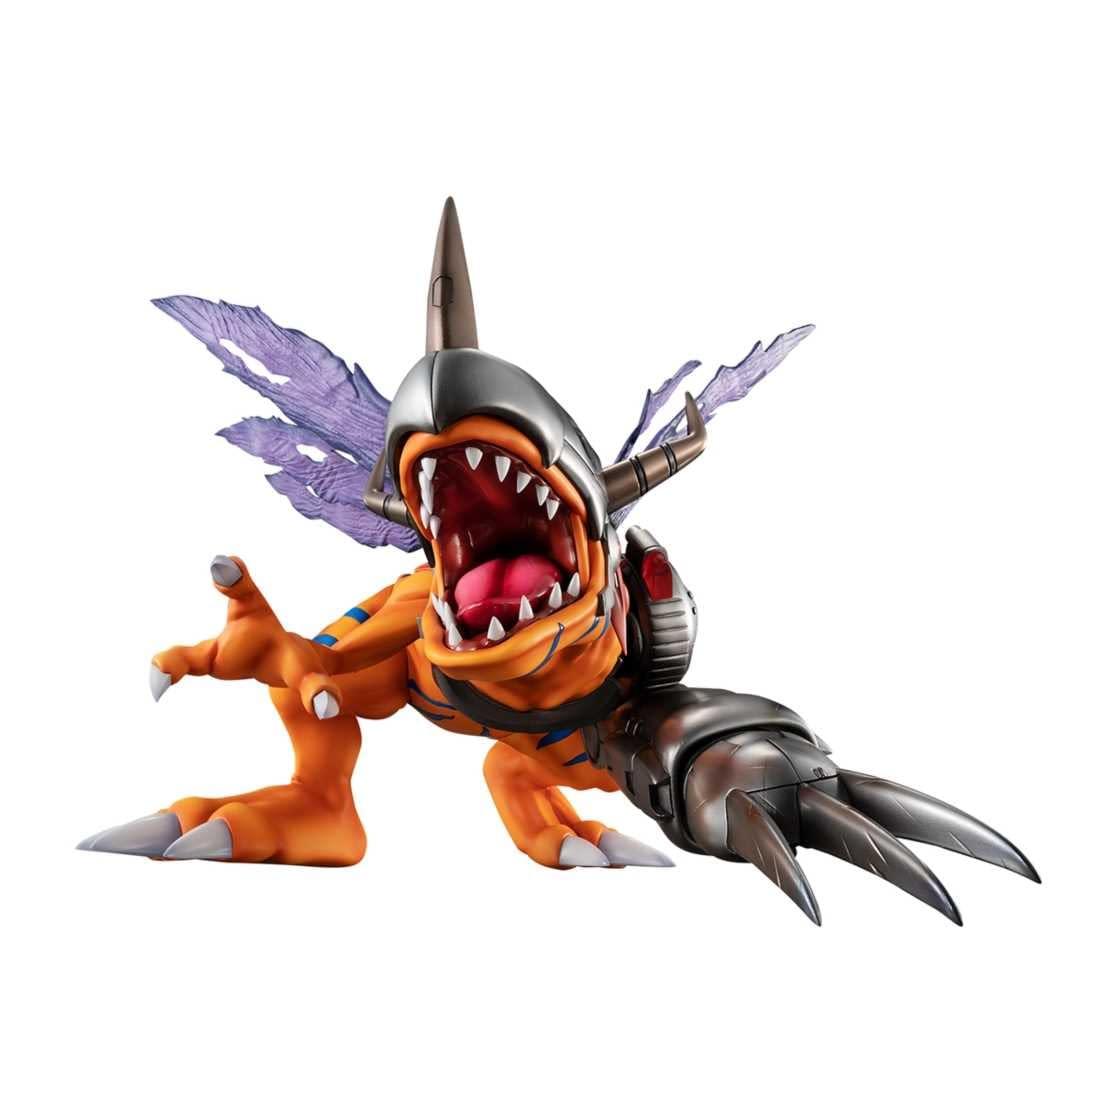 """Digimon"" Returns with MetalGreymon Statue from Megahouse"